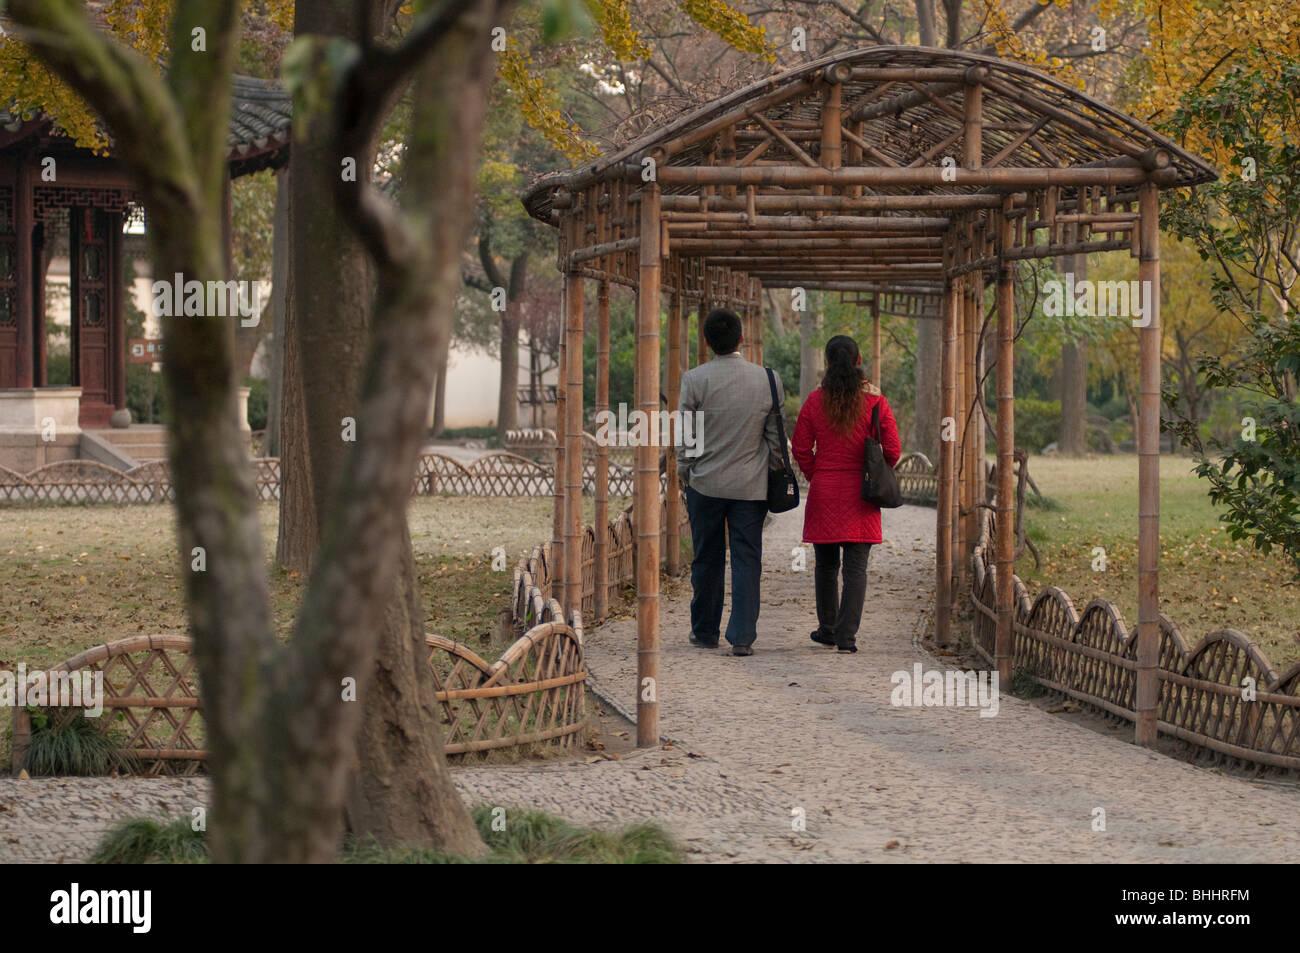 El Jardín del Administrador Humilde, Suzhou, provincia de Jiangsu, China, Asia Imagen De Stock